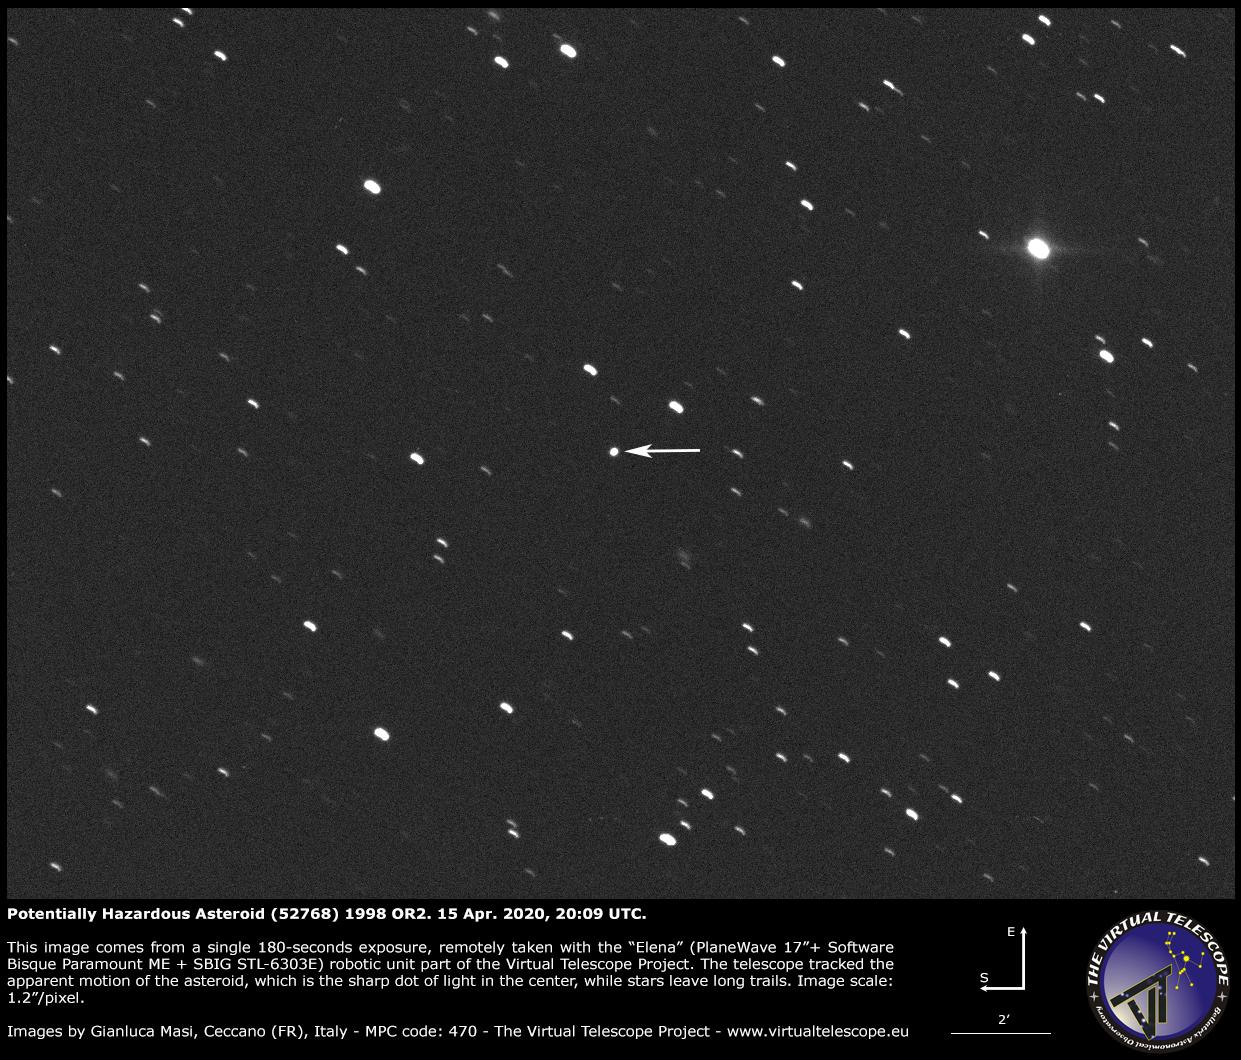 Potentially Hazardous Asteroid (52768) 1998 OR2: a image - 15 Apr. 2020